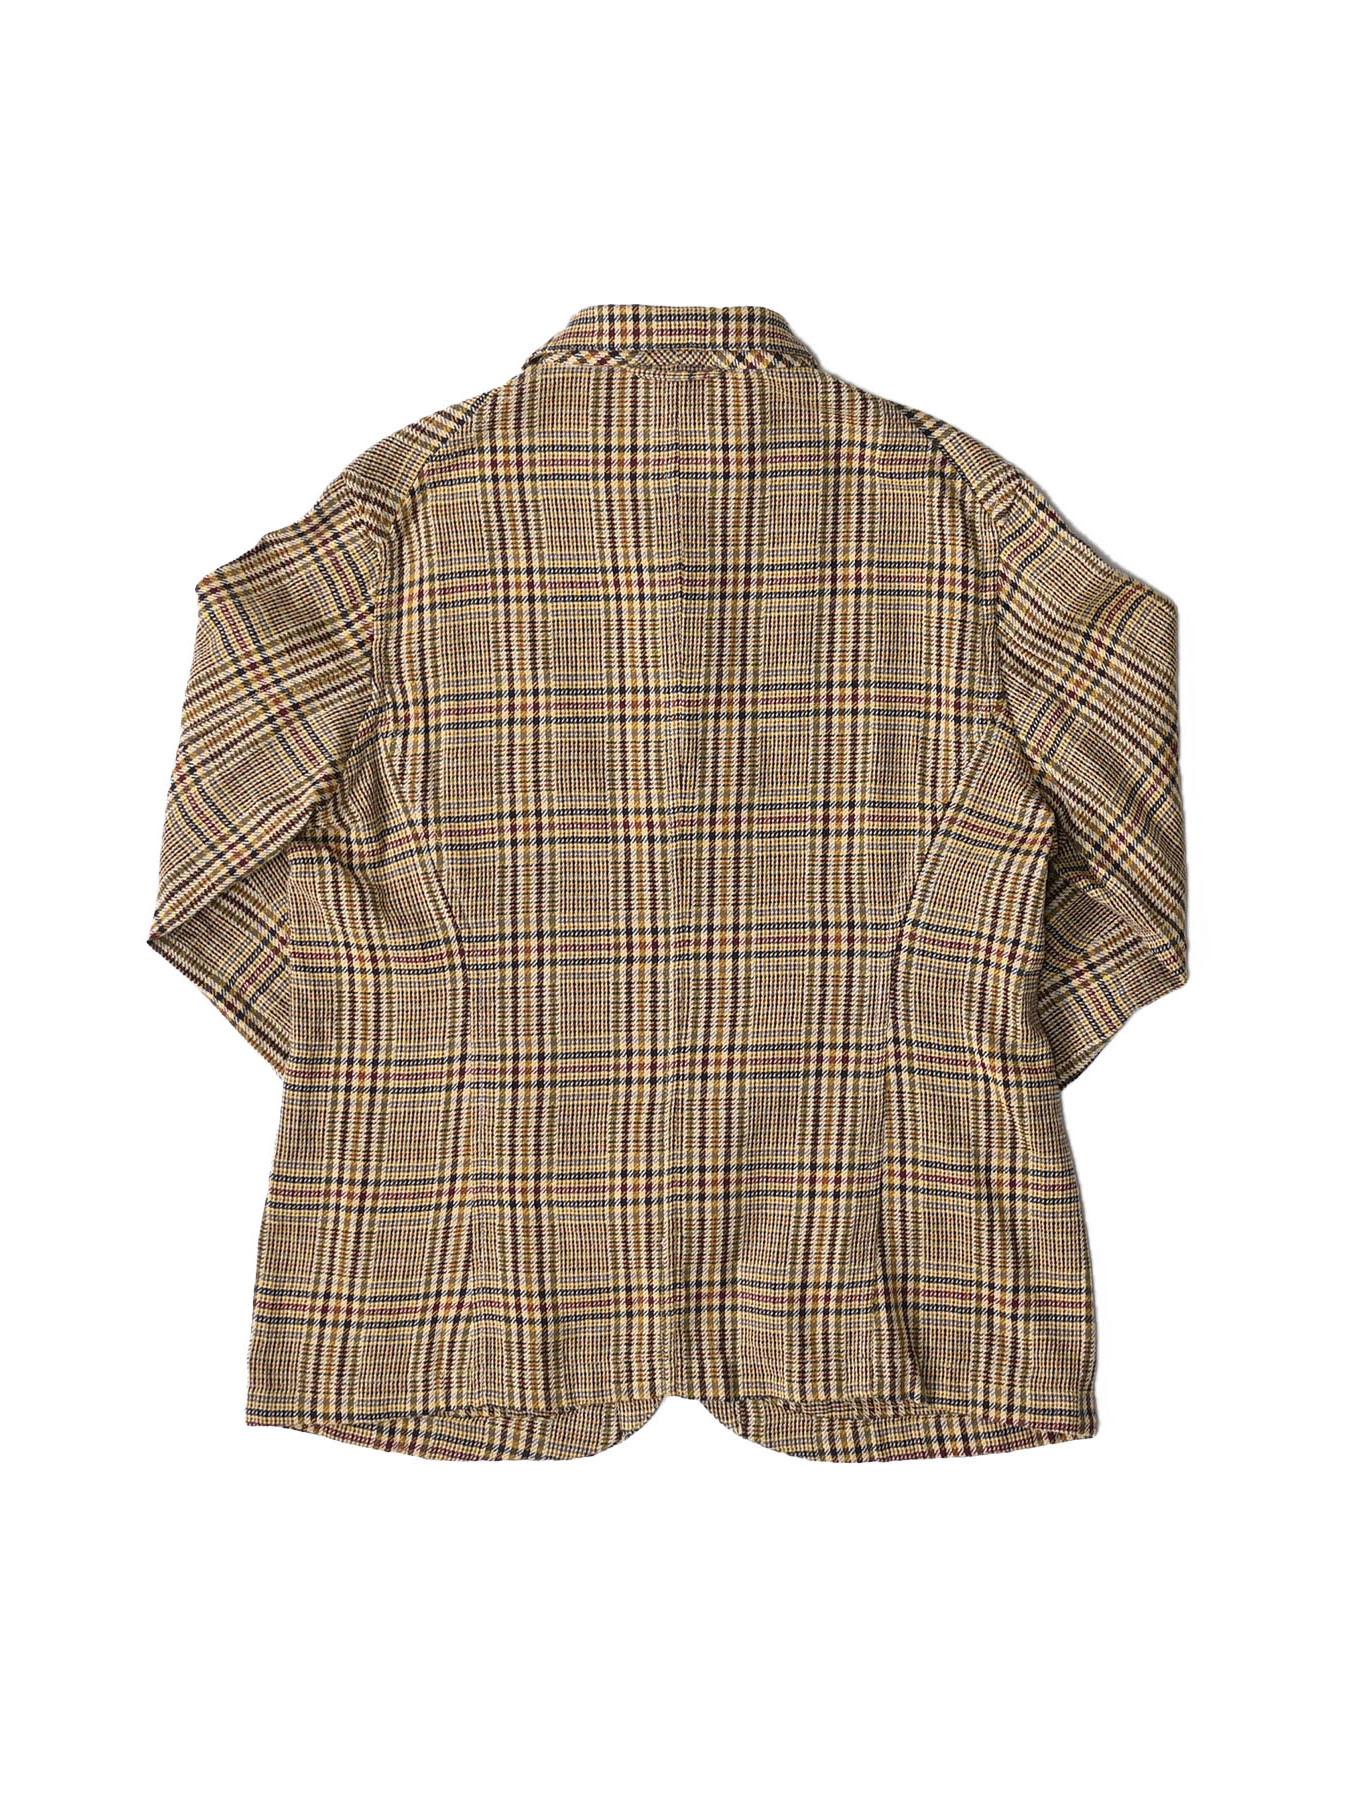 Indian Flannel Shirt-Jacket-7